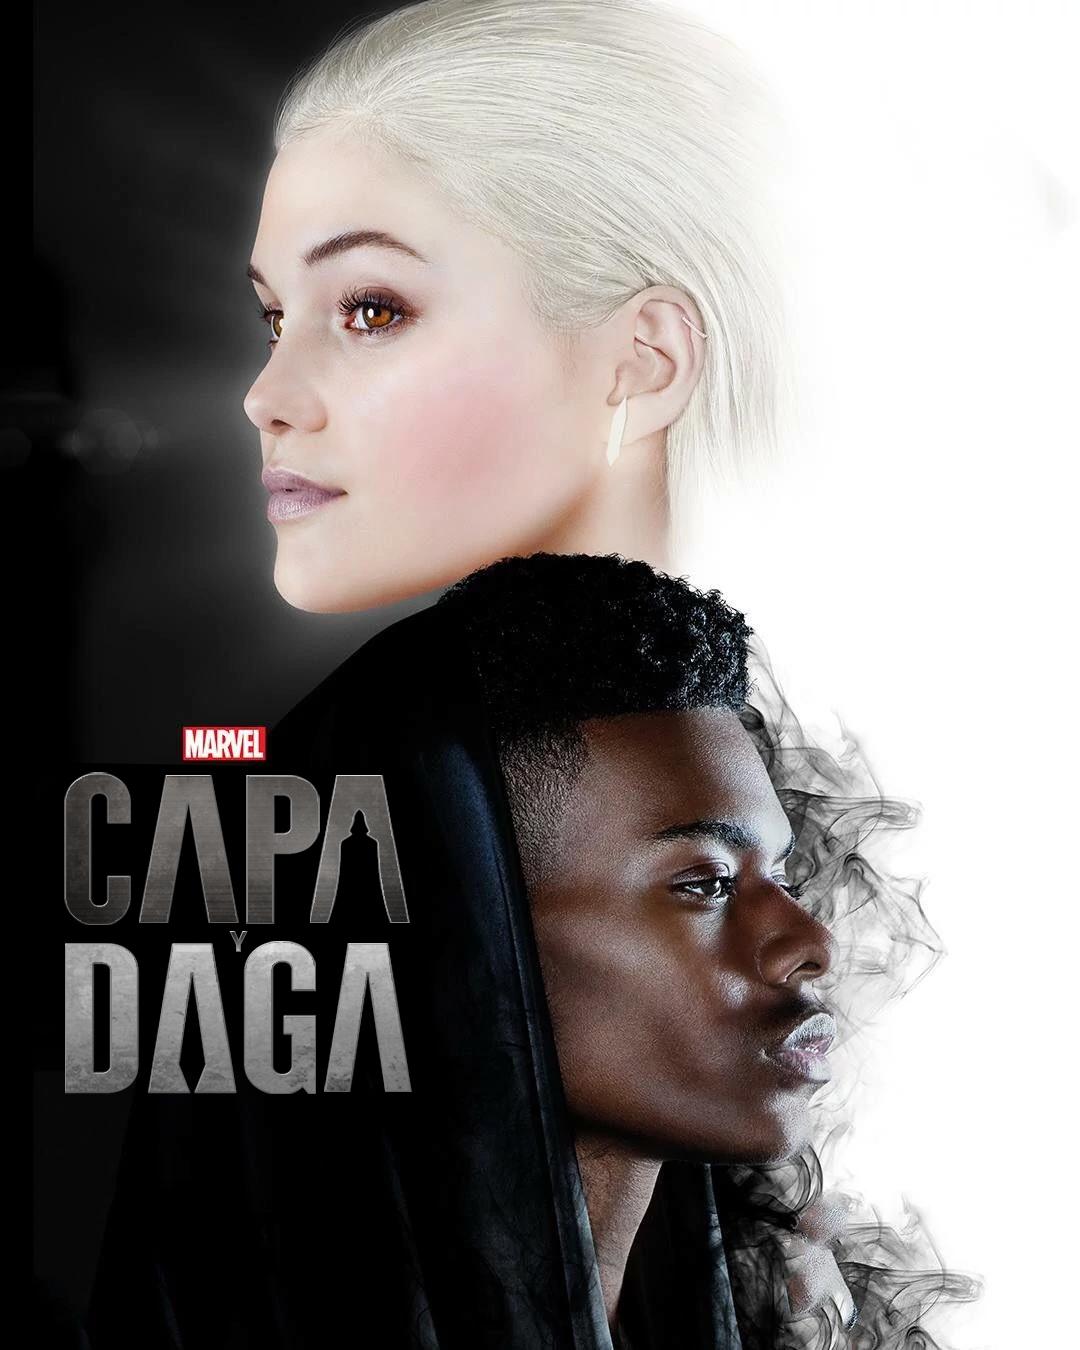 Capa y Daga